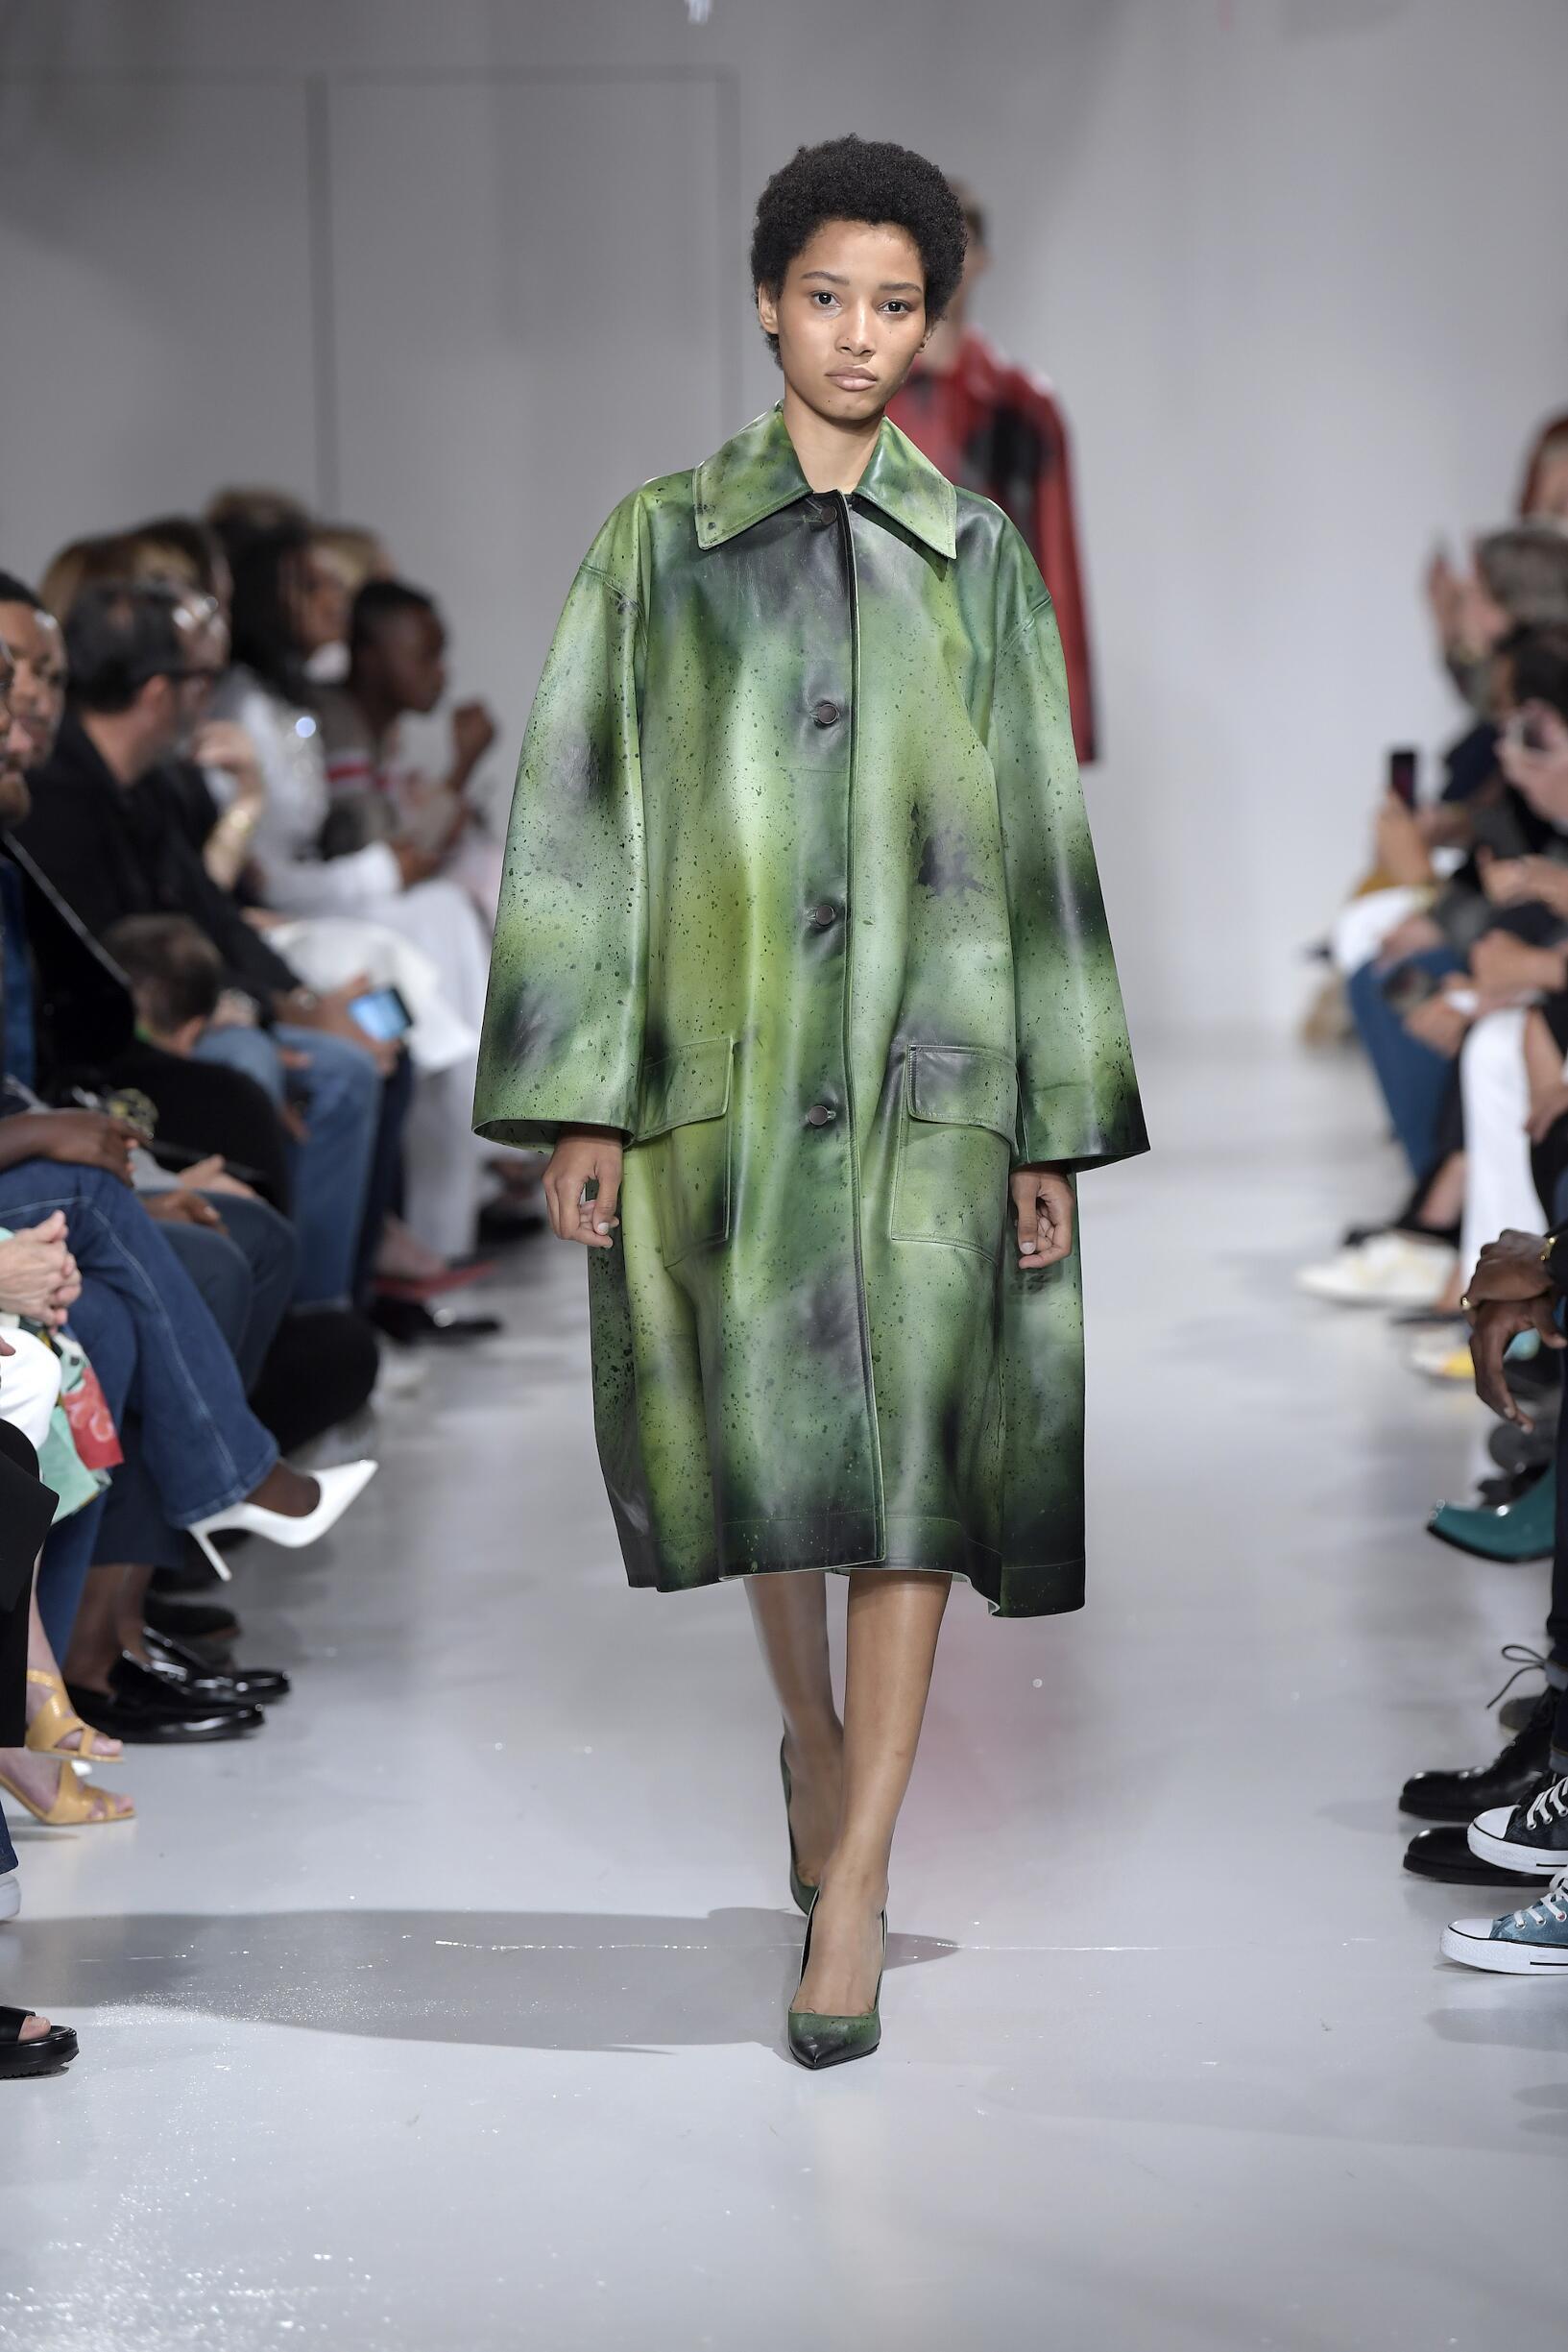 Catwalk Calvin Klein 205W39NYC Woman Fashion Show Summer 2018